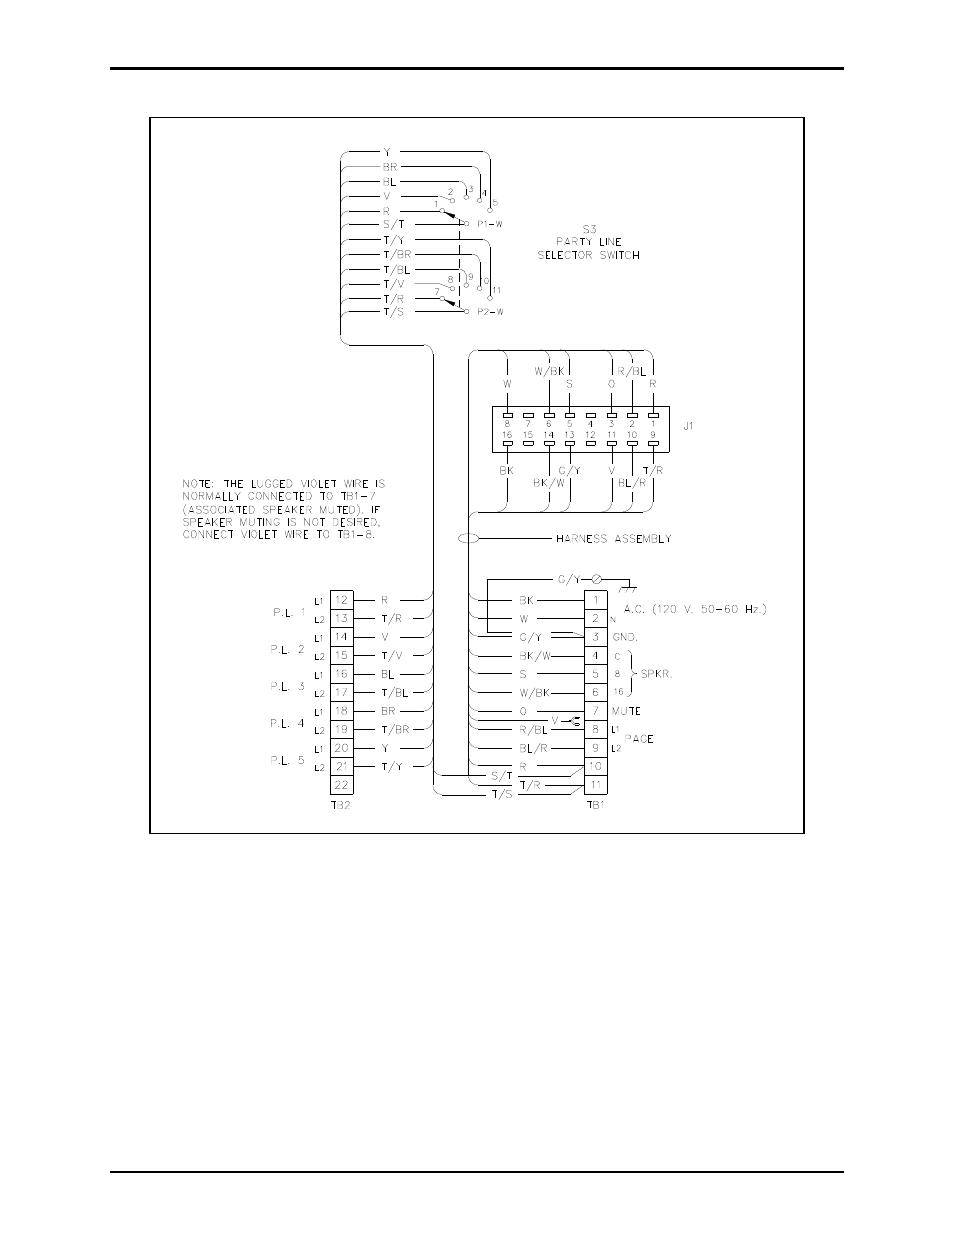 GAI-Tronics 703A Indoor Multi-Party 115 V AC Amplifier ... on a c parts diagram, a c system diagram, a c relay diagram, a c compressor diagram, a c flow diagram, a c clutch diagram, a c components diagram, a c circuit diagram, a c schematic diagram,